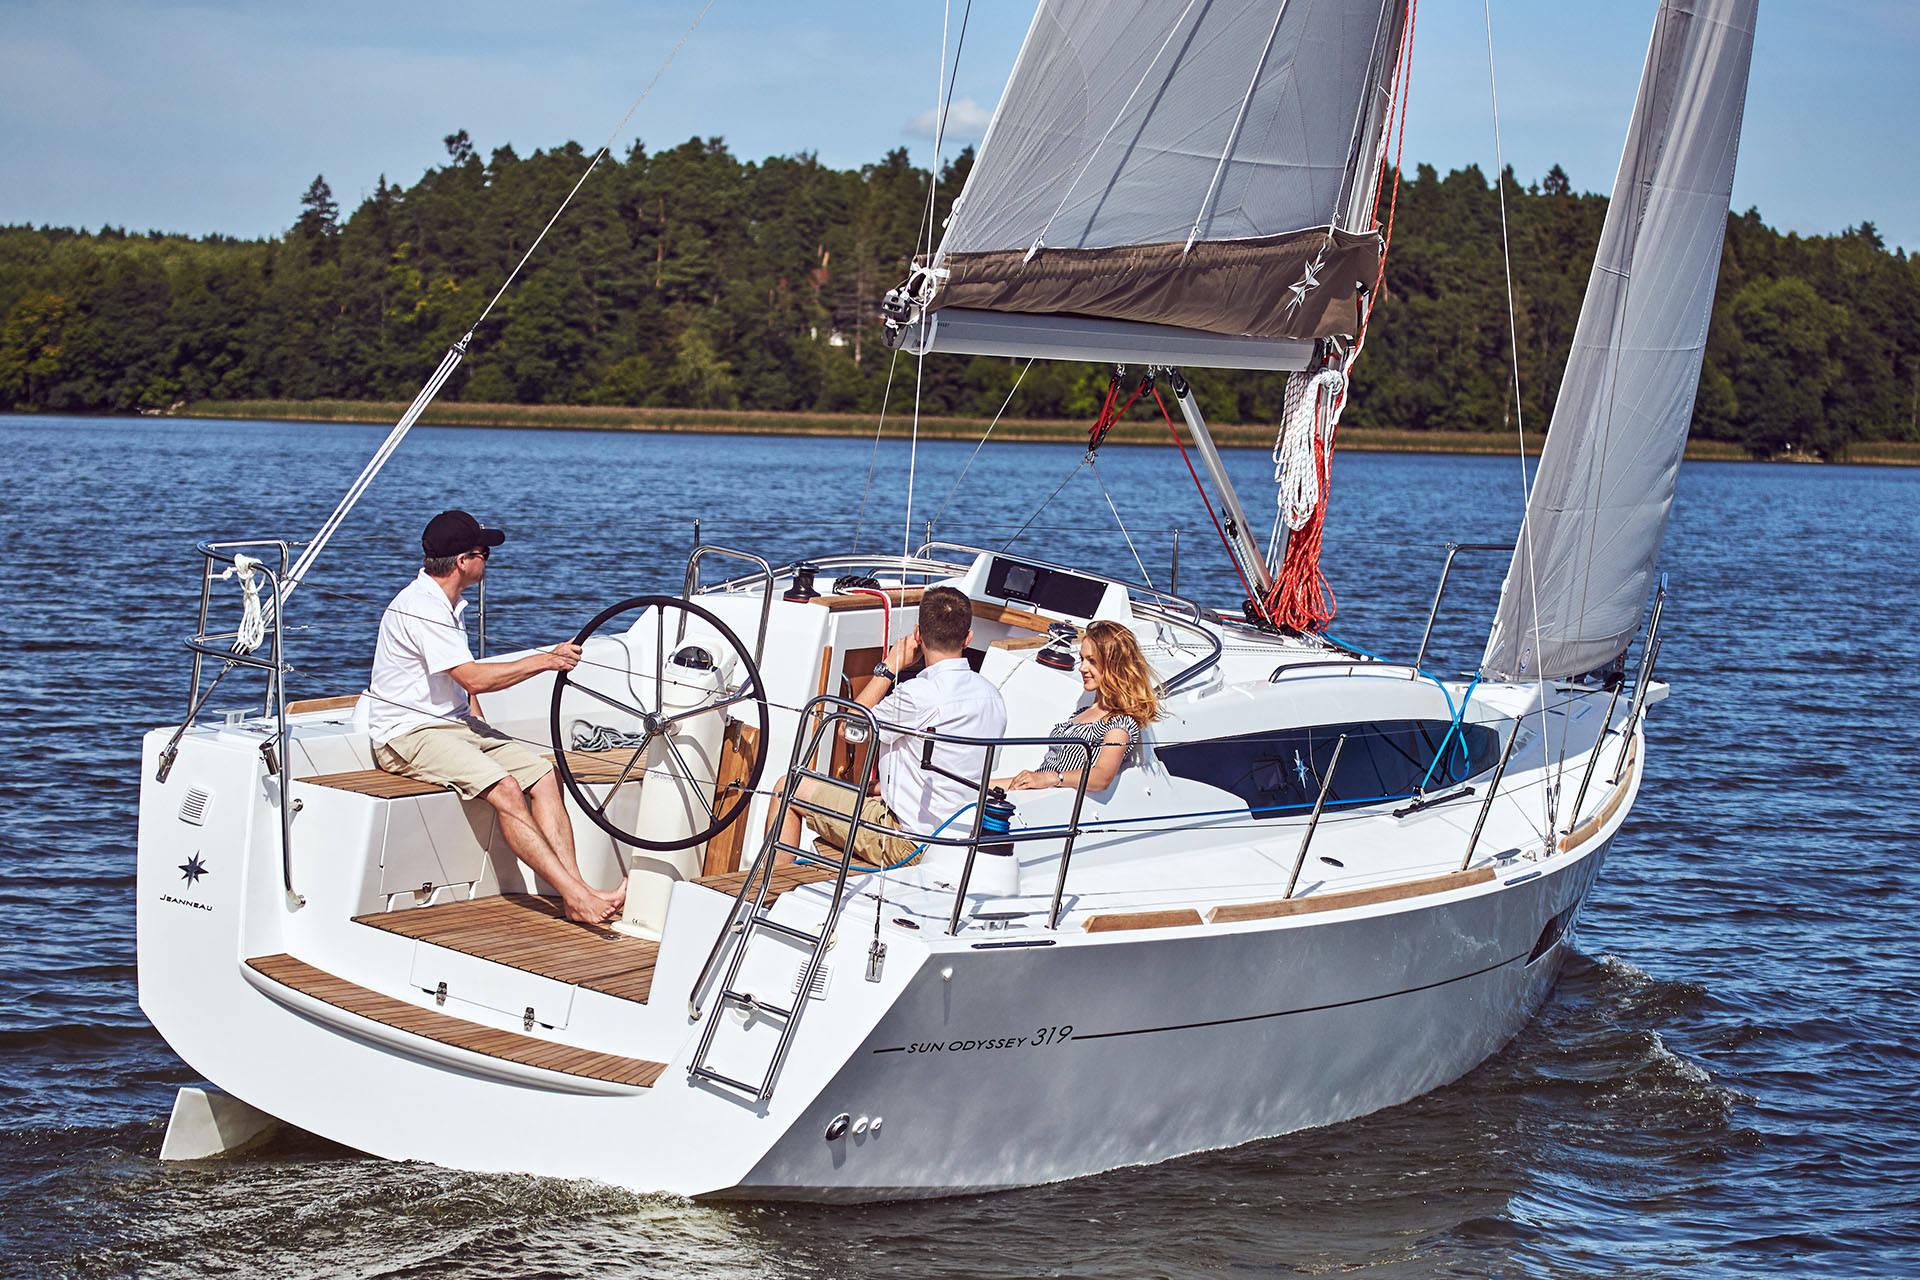 Trend Travel Yachting, Jeanneau Sun Odyssey 319. Titelbild